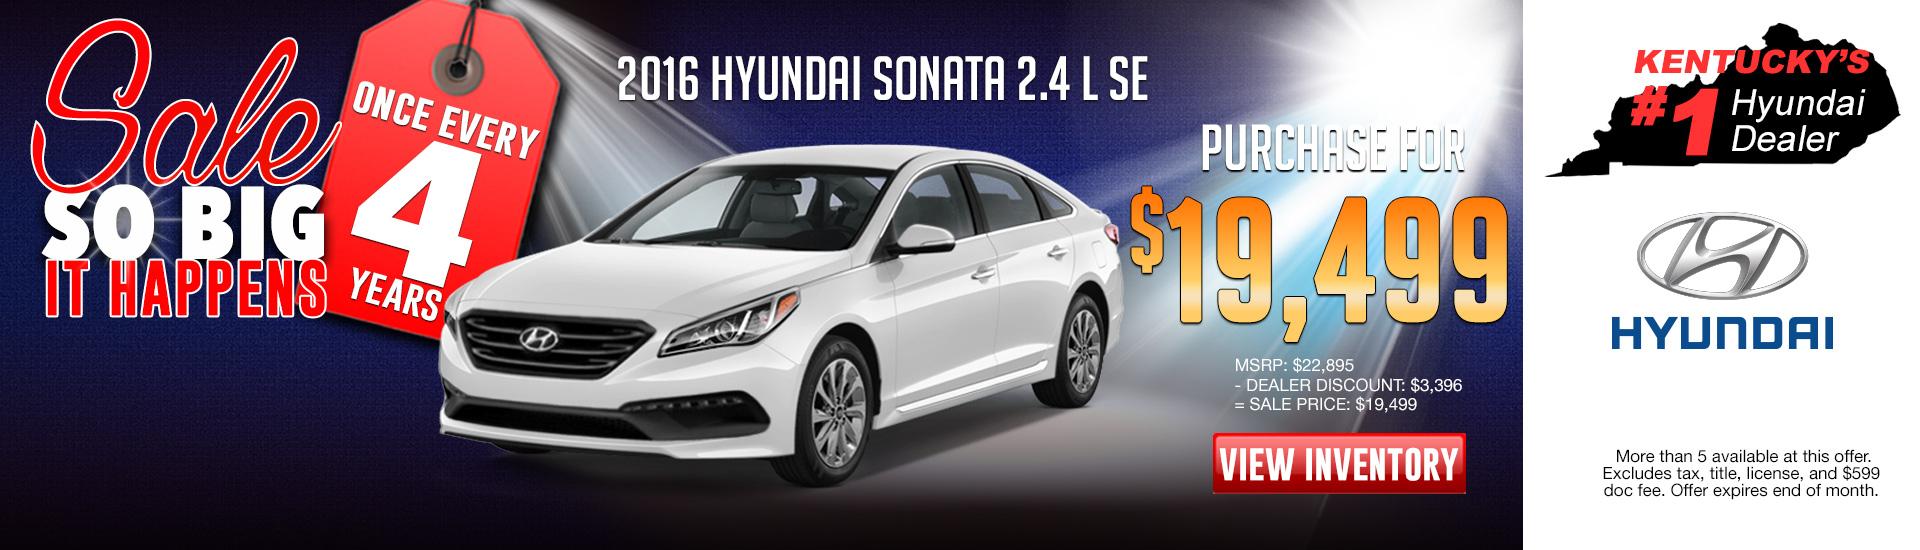 All New 2016 Hyundai Sonata SE